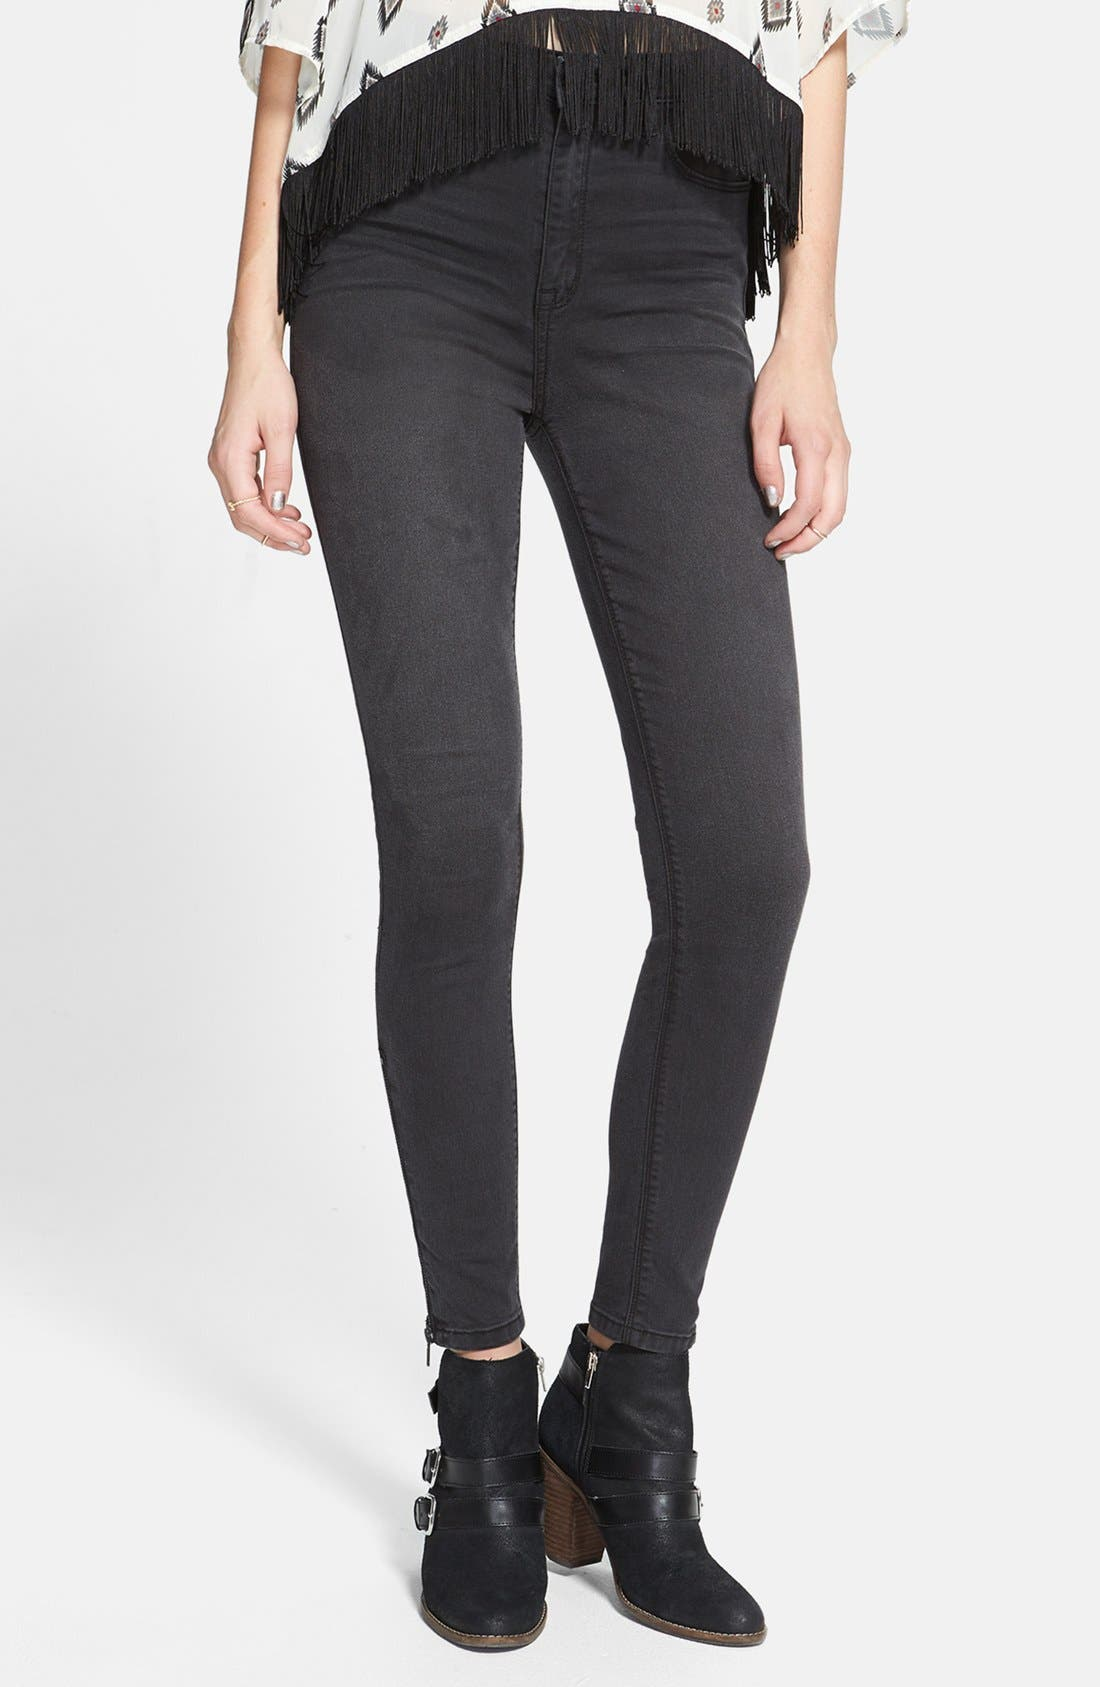 Alternate Image 1 Selected - SP Black High Waist Ankle Zip Skinny Jeans (Dark Grey) (Juniors) (Online Only)